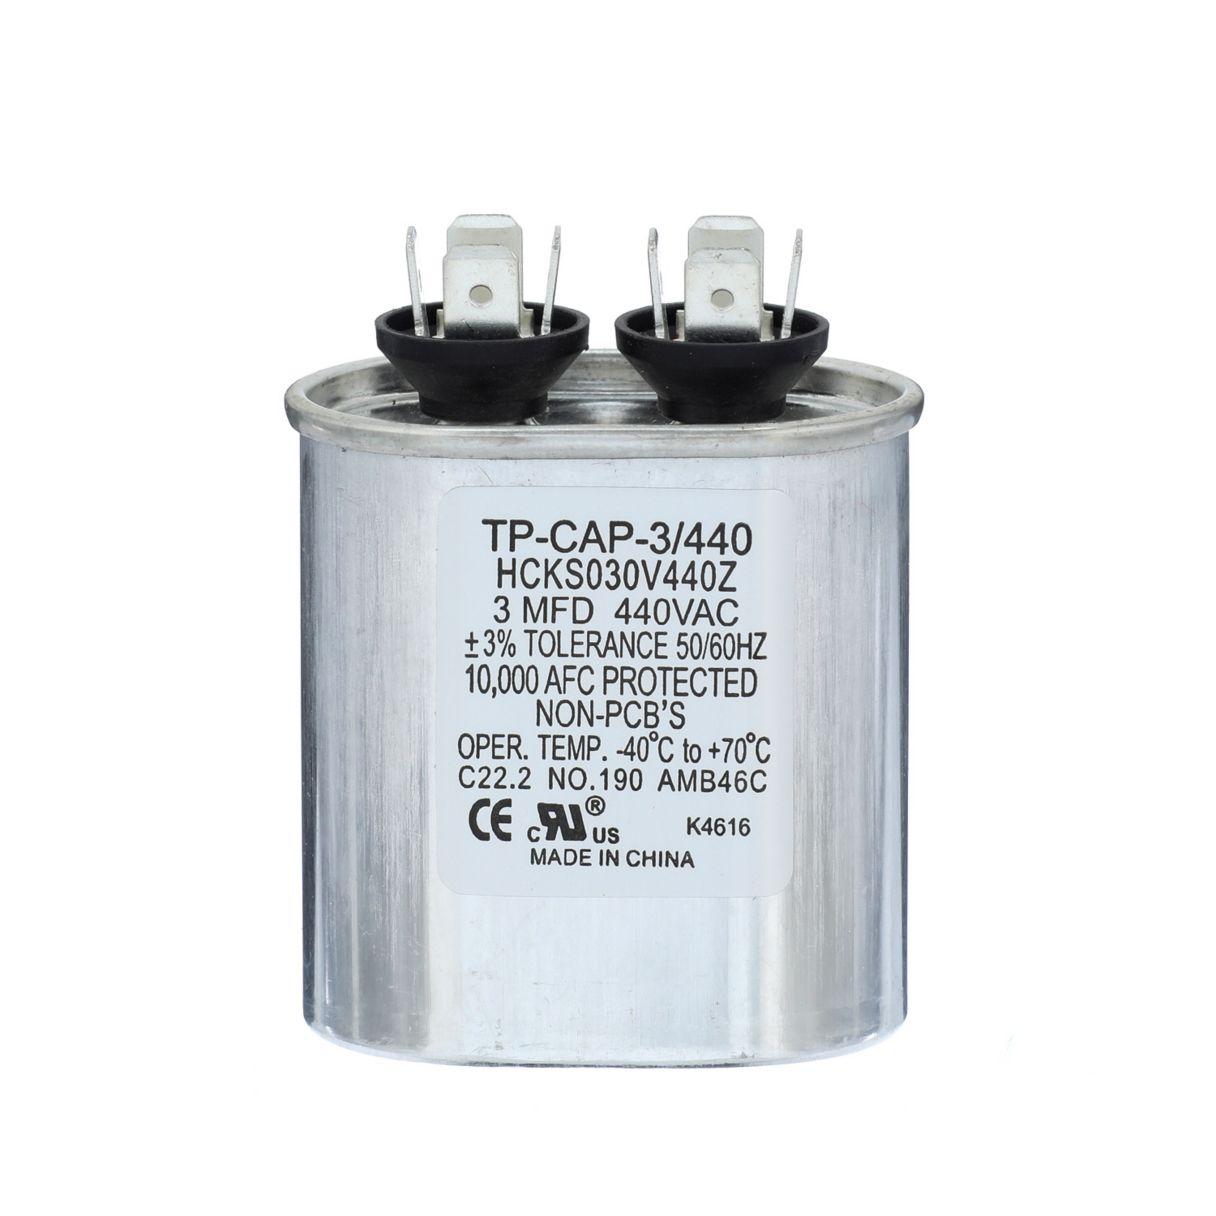 tradepro-capacitors-OVAL